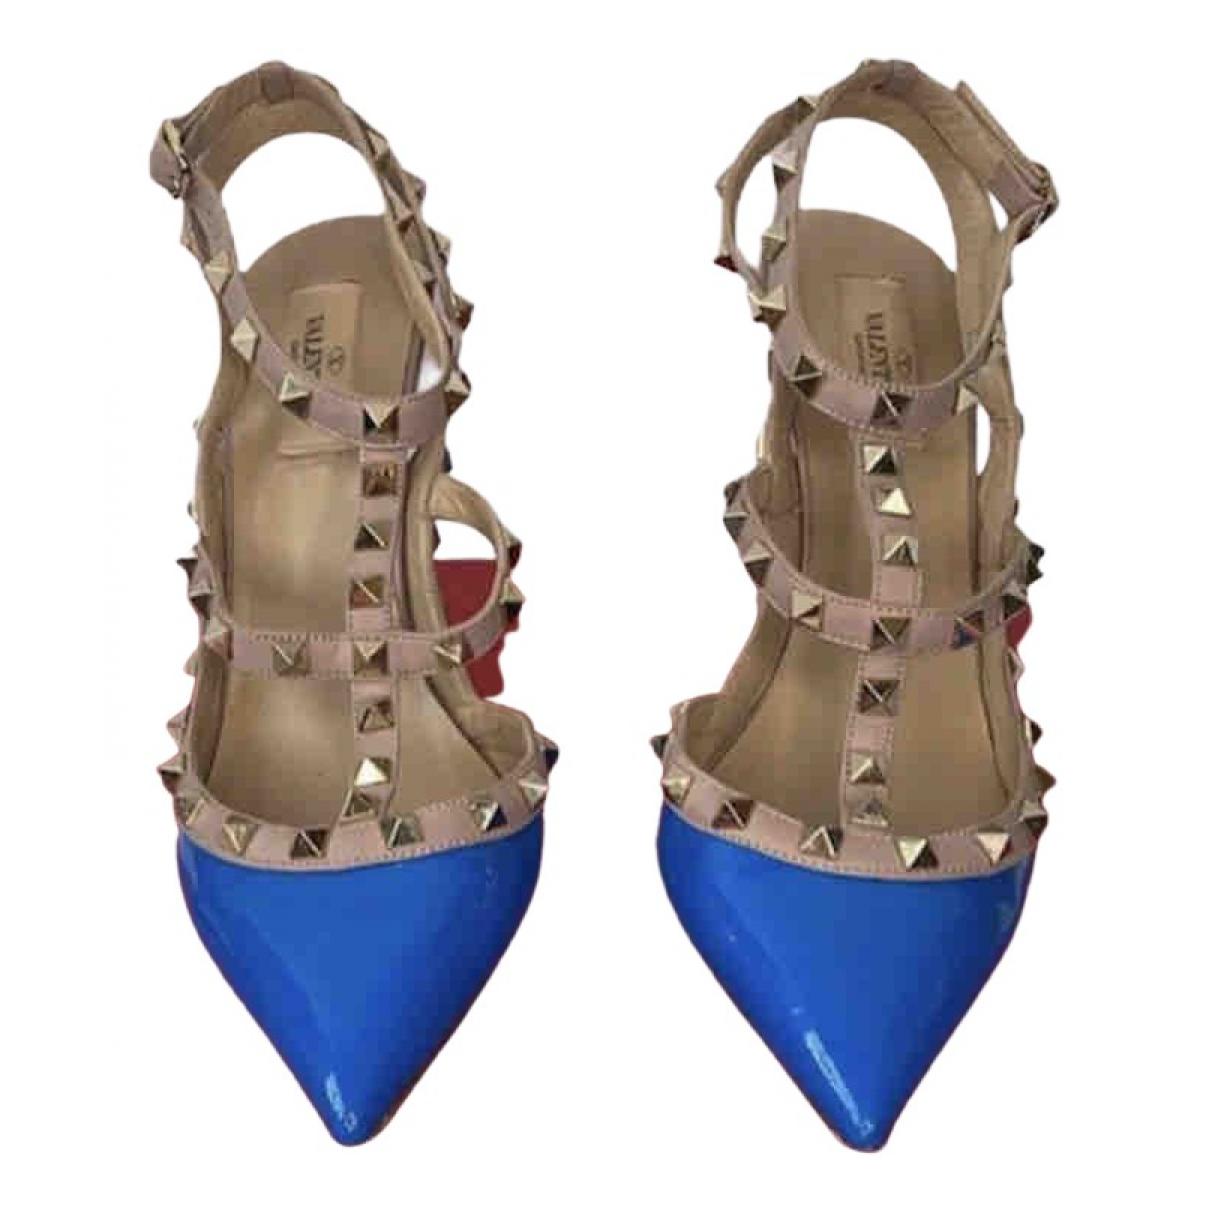 Valentino Garavani Rockstud Blue Patent leather Heels for Women 40 EU